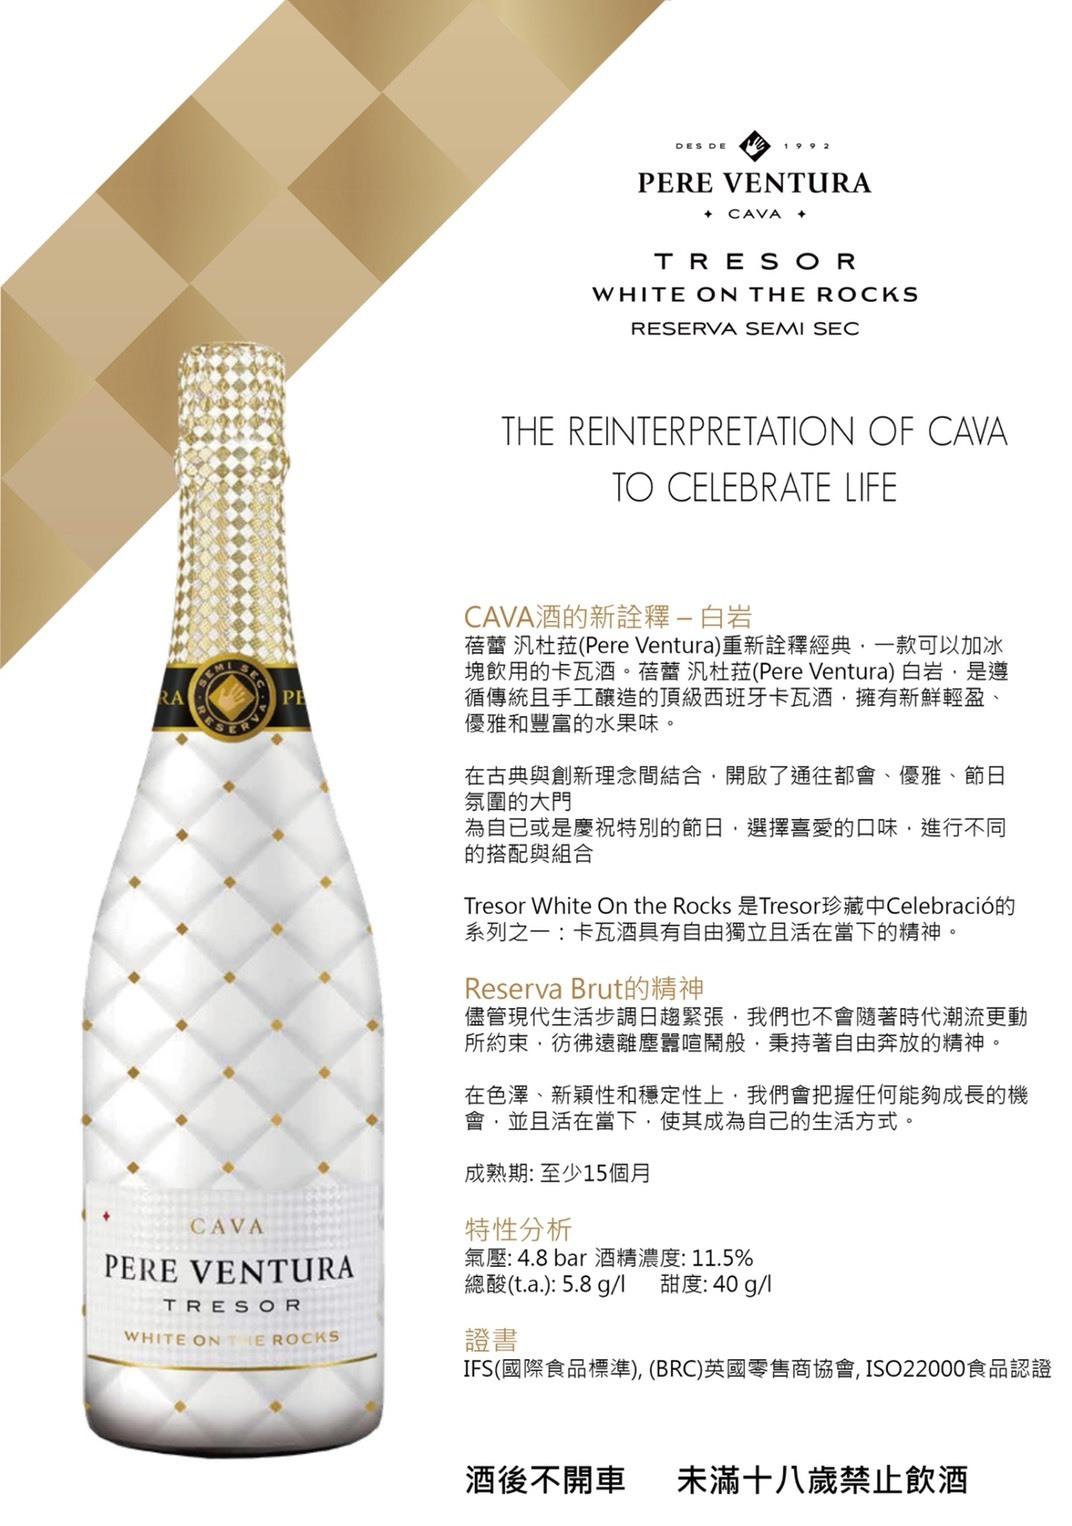 CAVA酒-新詮釋-白岩-蓓蕾-汎杜菈-Pere-Ventura-原價$1,800- CAVA-TRESOR-PERE-VENTURA-White-on-rocks